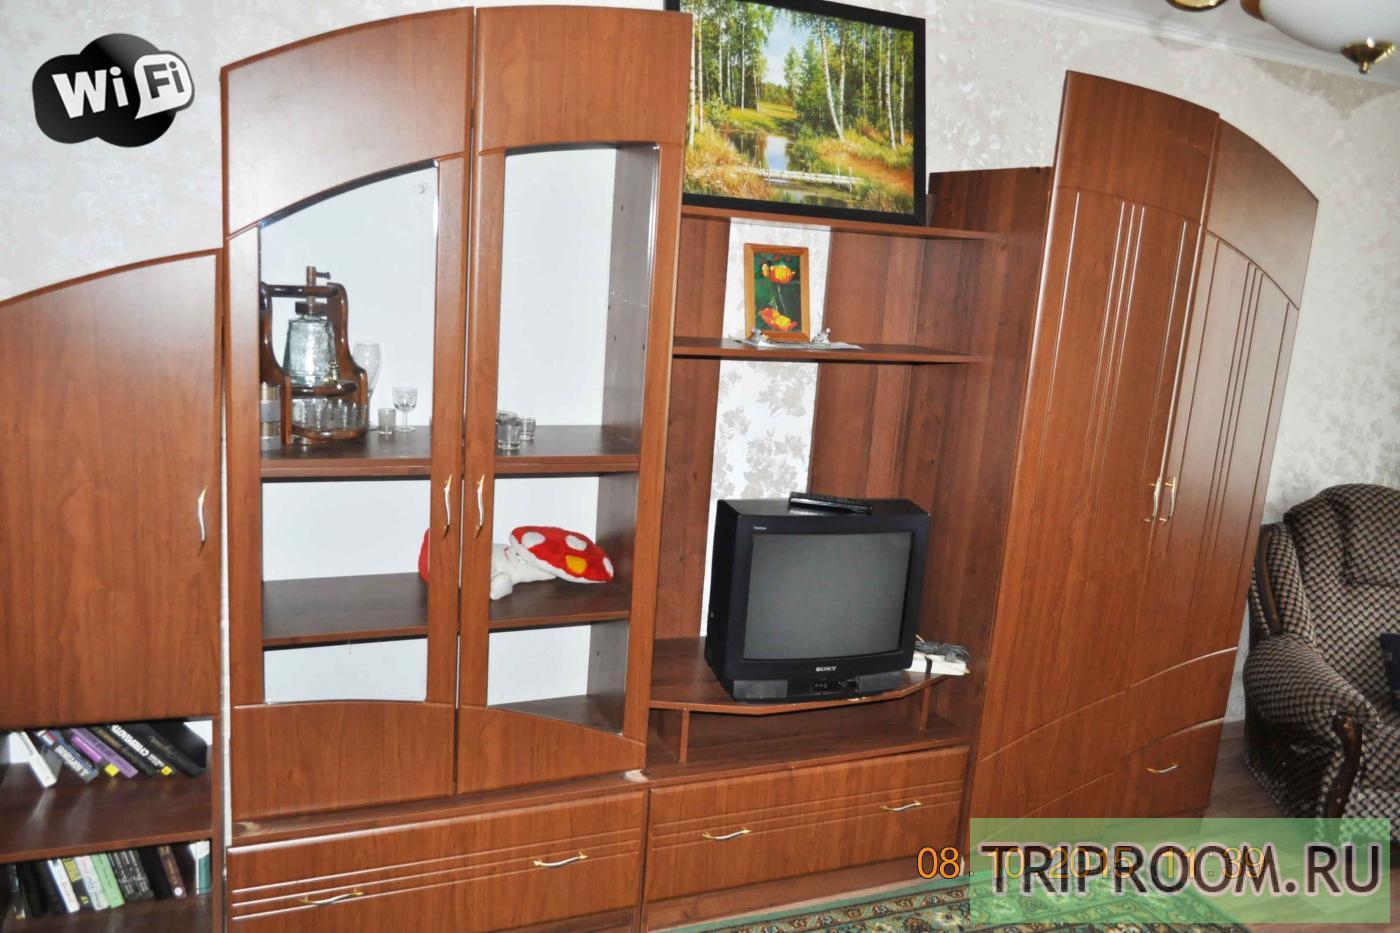 2-комнатная квартира посуточно (вариант № 11708), ул. Амосова улица, фото № 17